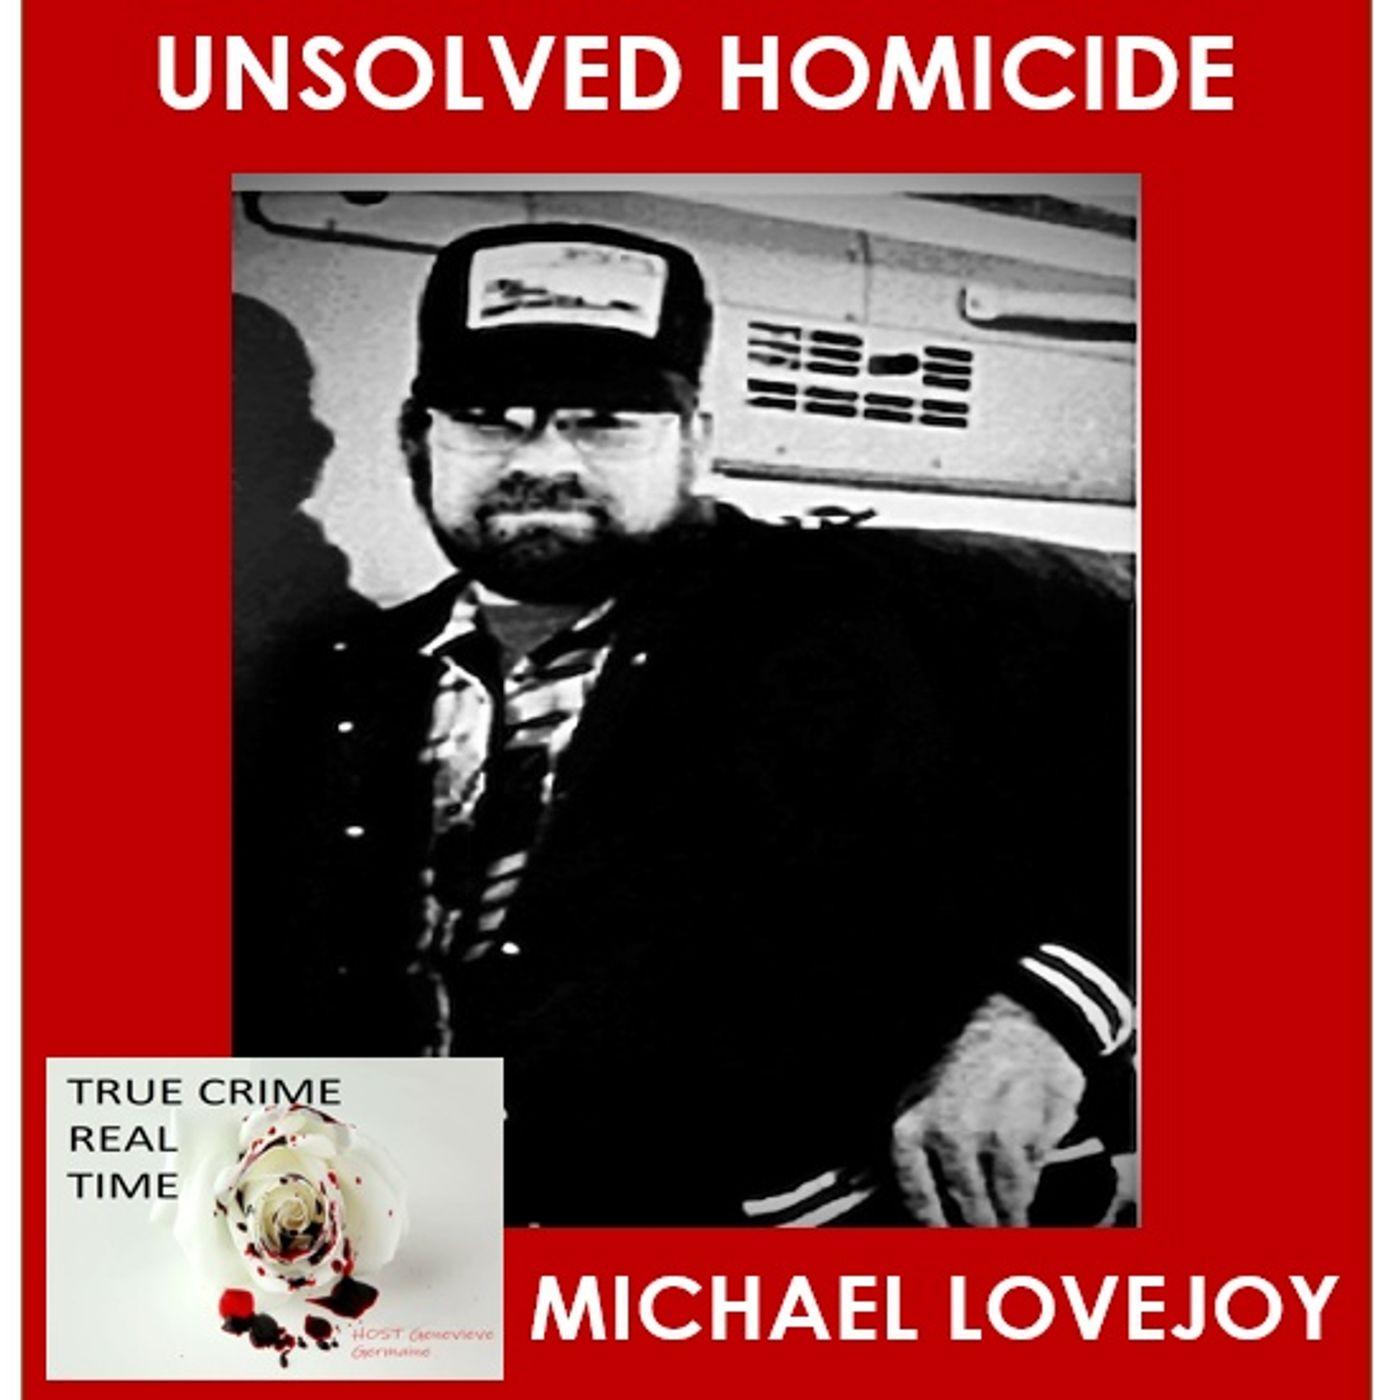 #16 - The Open Road - Michael Lovejoy